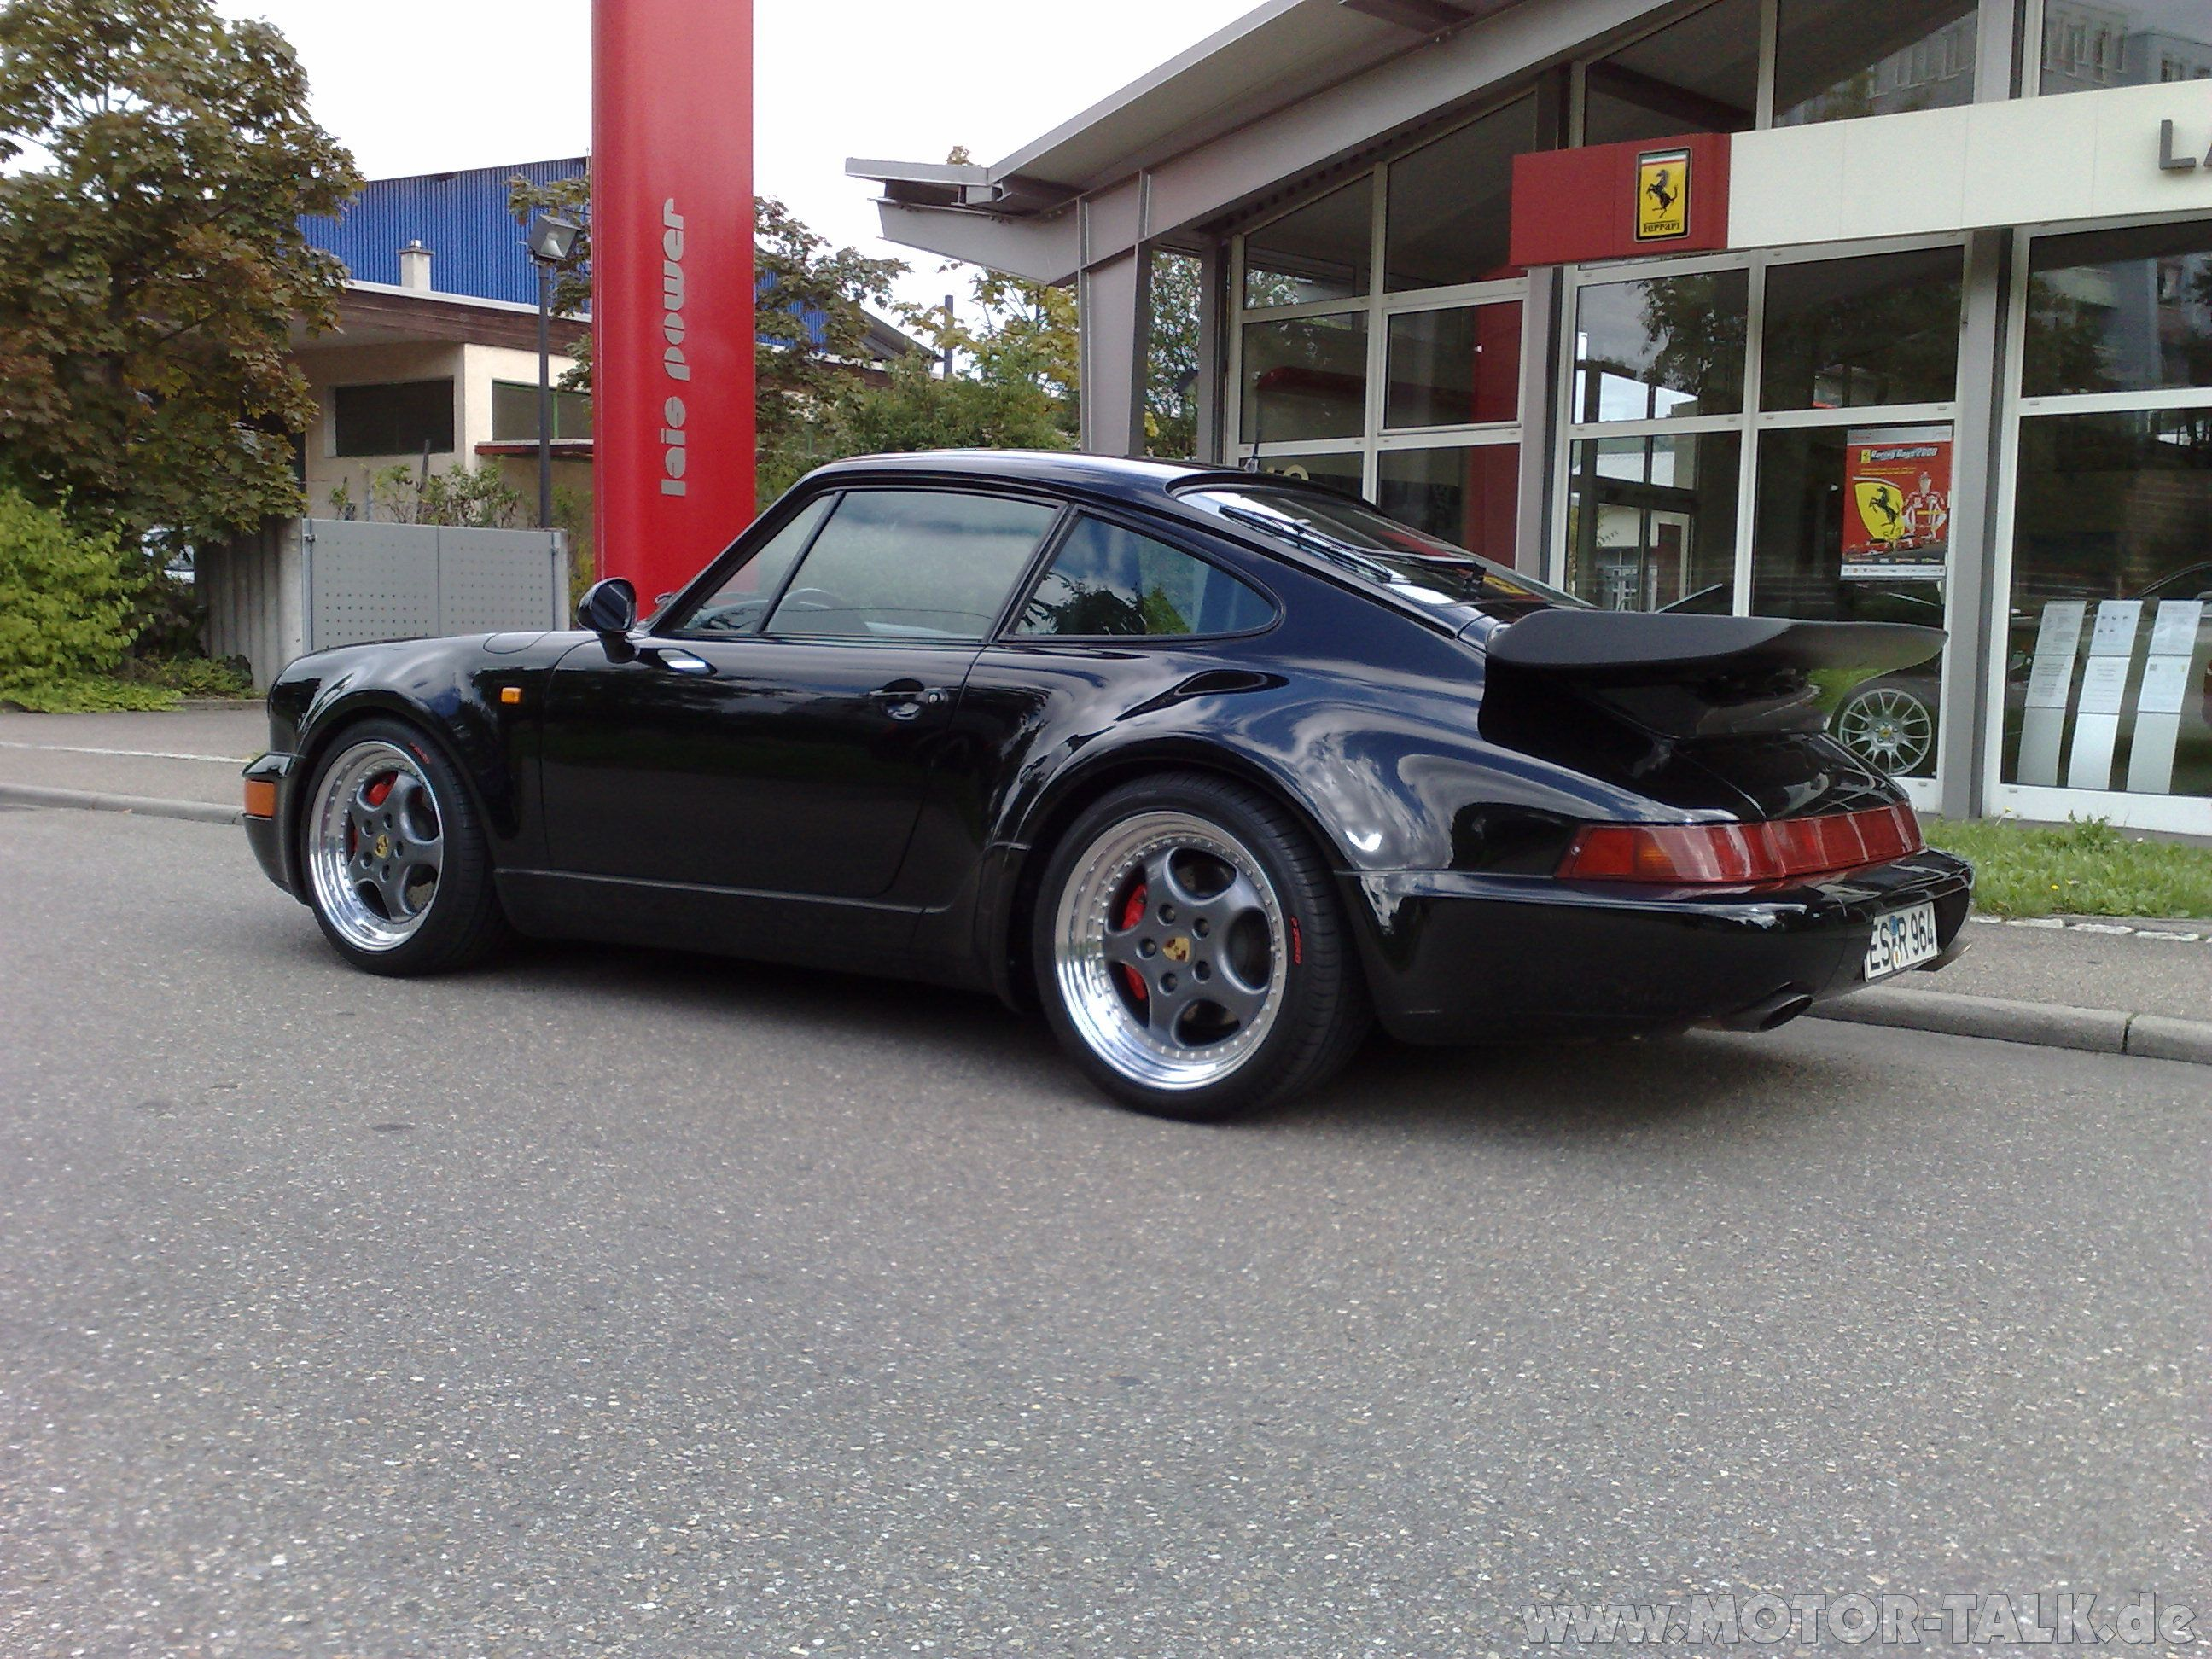 Porsche 965: Best Images Collection of Porsche 965